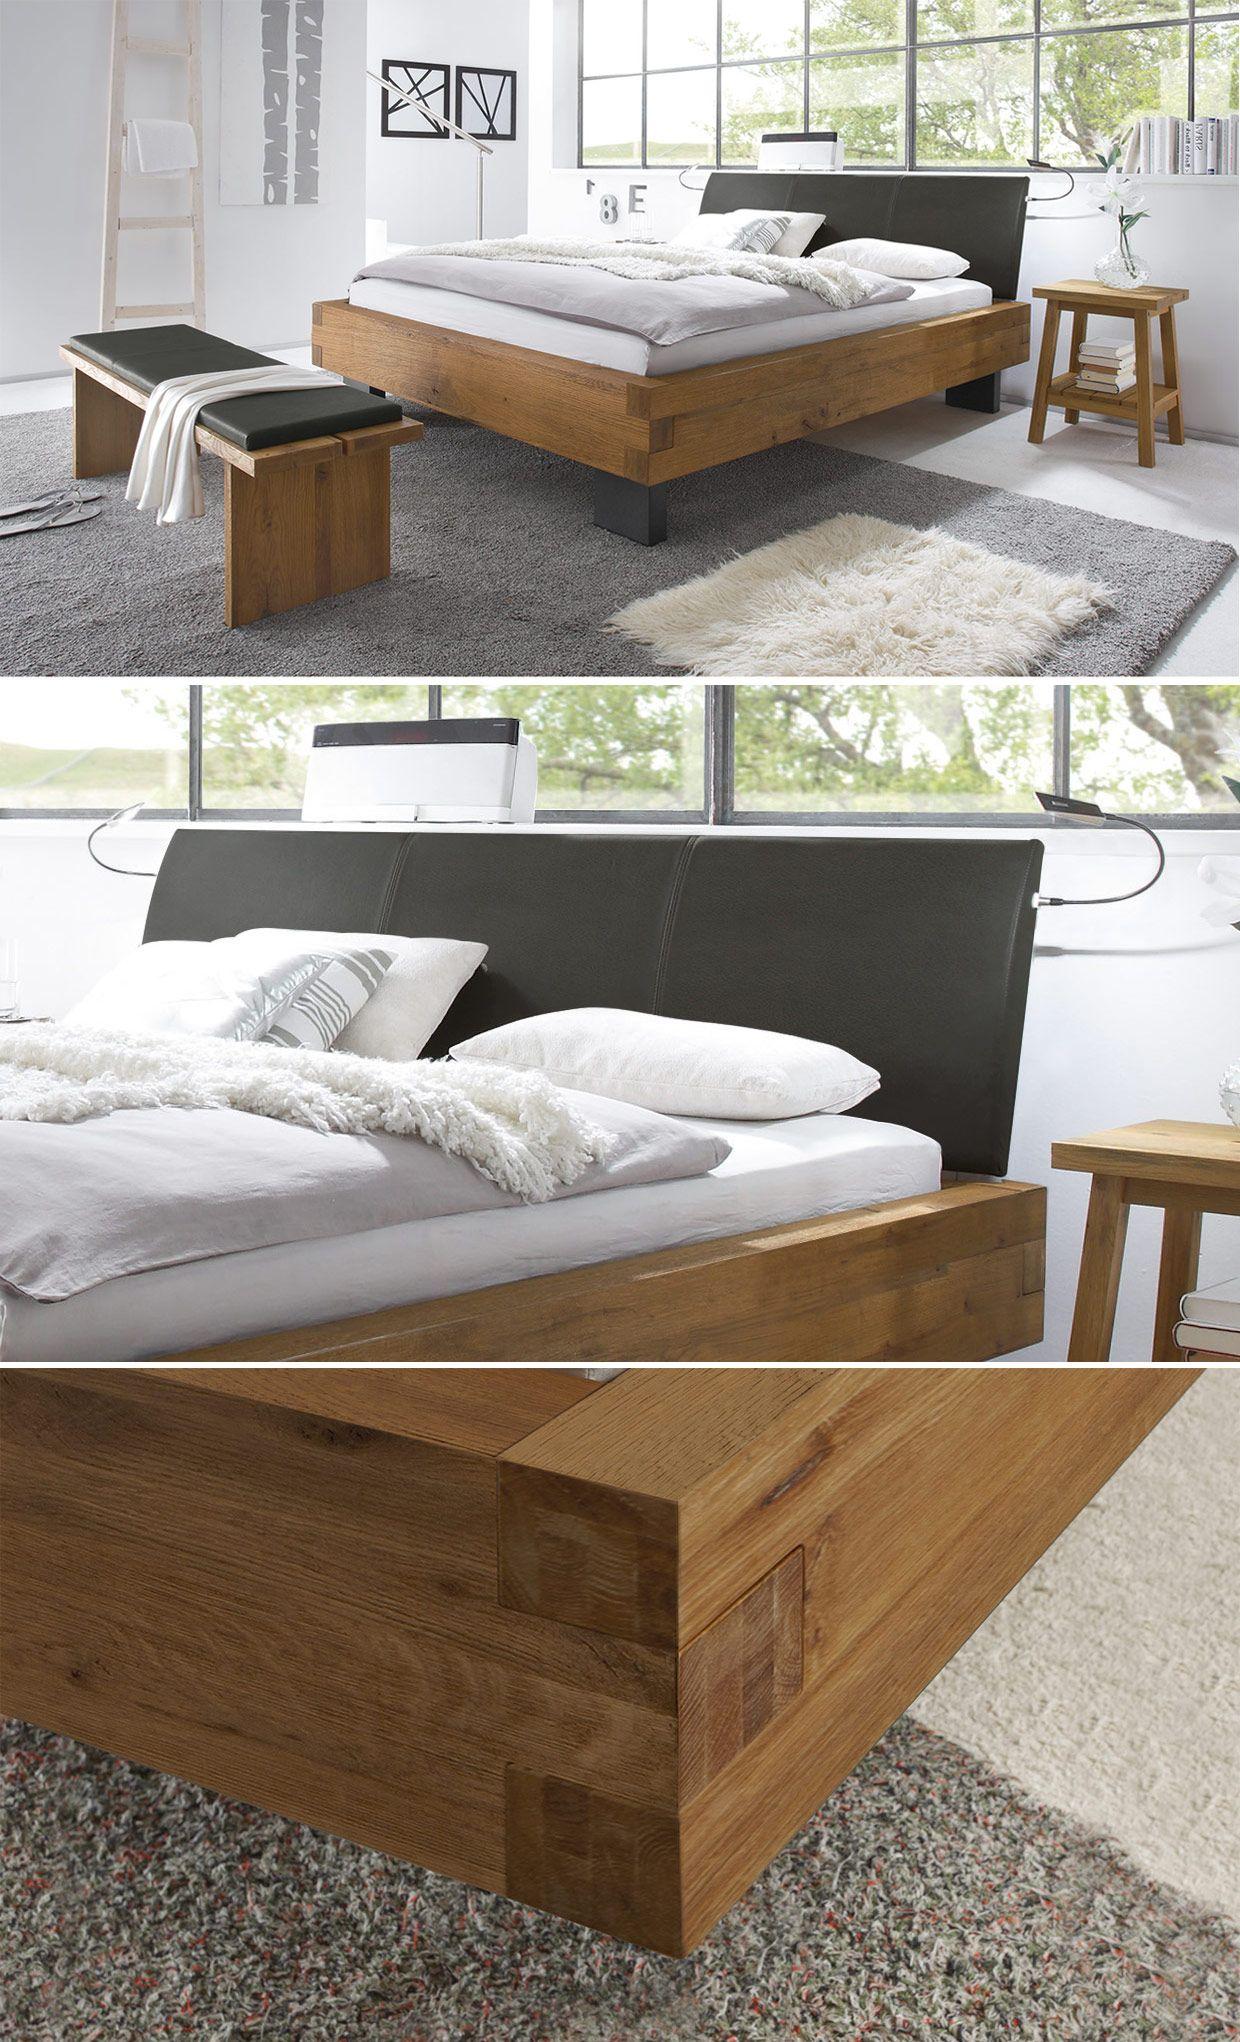 Full Size of Bett Modern 140x200 Beyond Better Sleep Pillow Eiche Design Holz Betten 120x200 Leader Kaufen 180x200 Italienisches Puristisch Günstig Bette Duschwanne Ruf Wohnzimmer Bett Modern